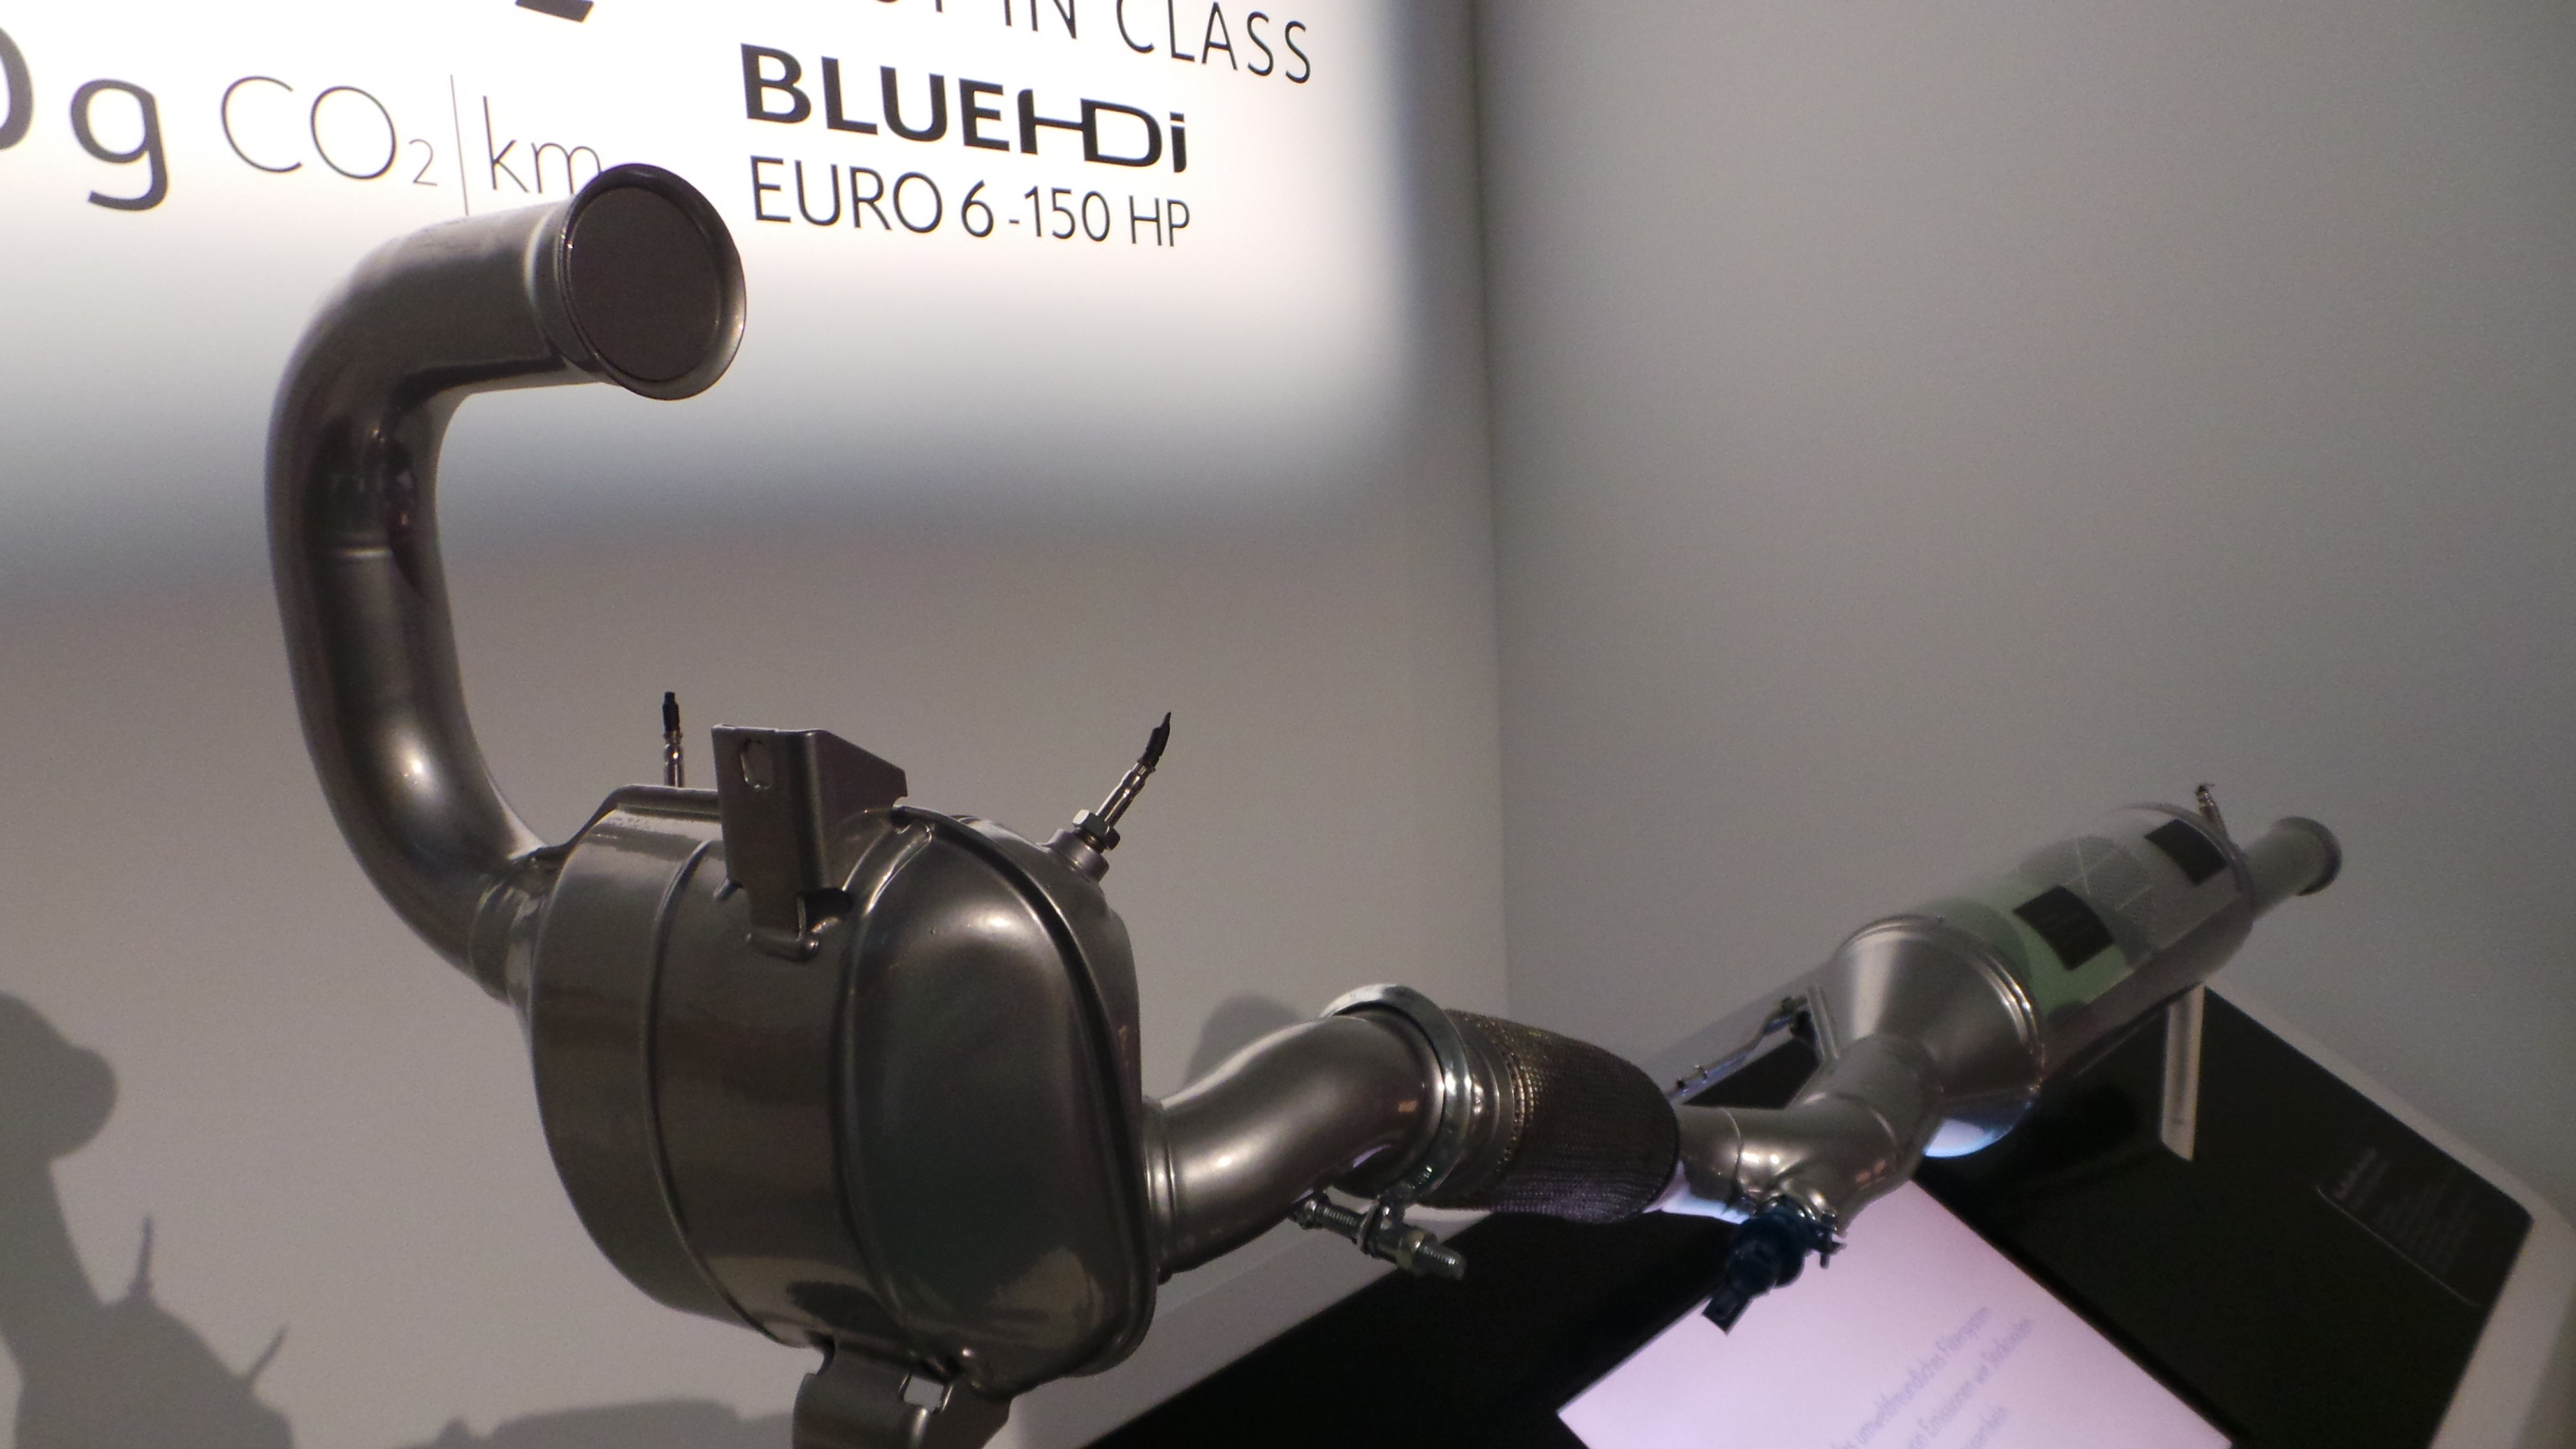 citro n grand c4 picasso moteur bluehdi 150 les enjoliveuses. Black Bedroom Furniture Sets. Home Design Ideas